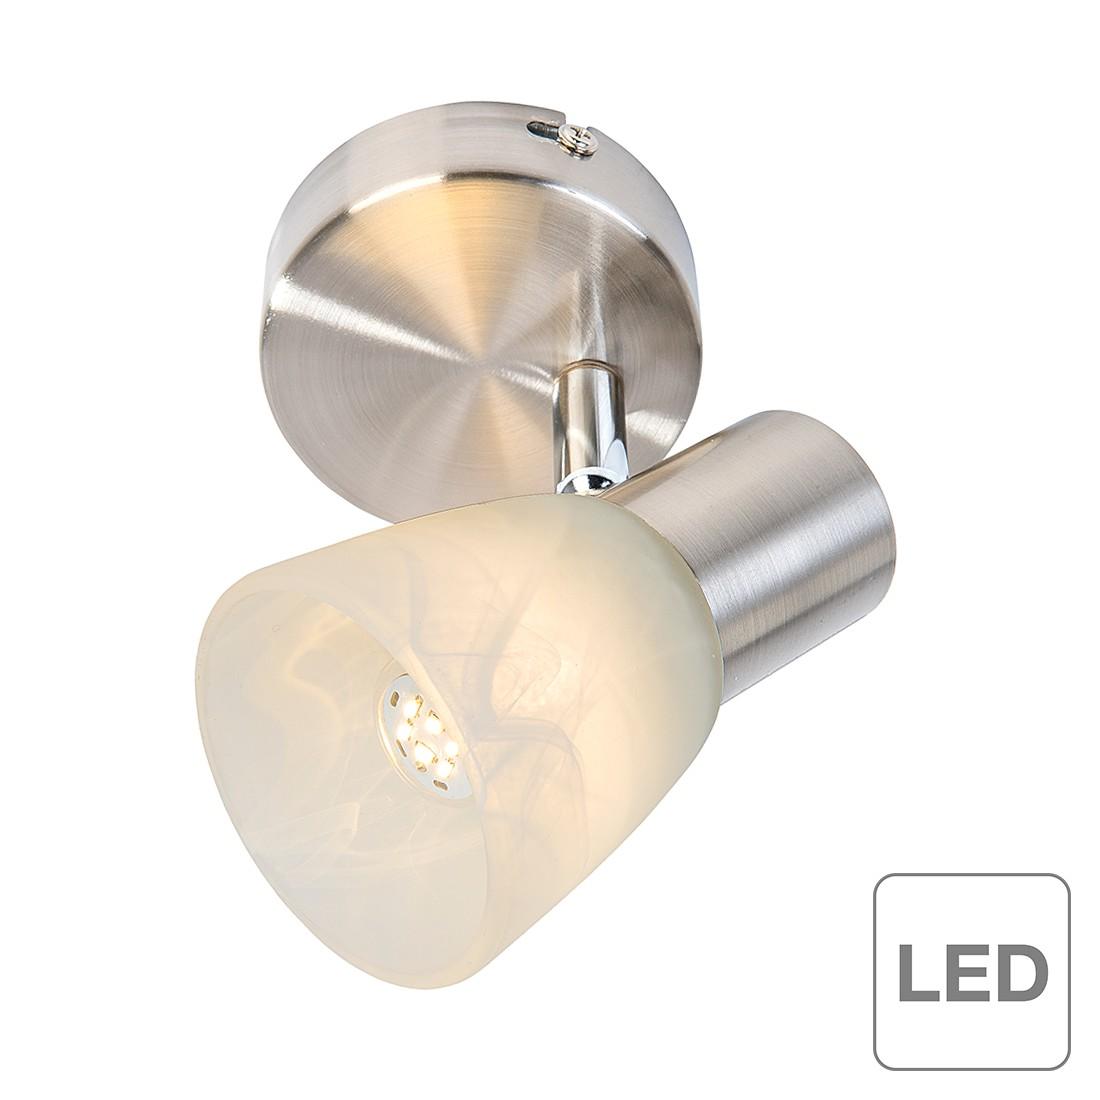 LED-Spot Ancona - 1-flammig, Nino Leuchten